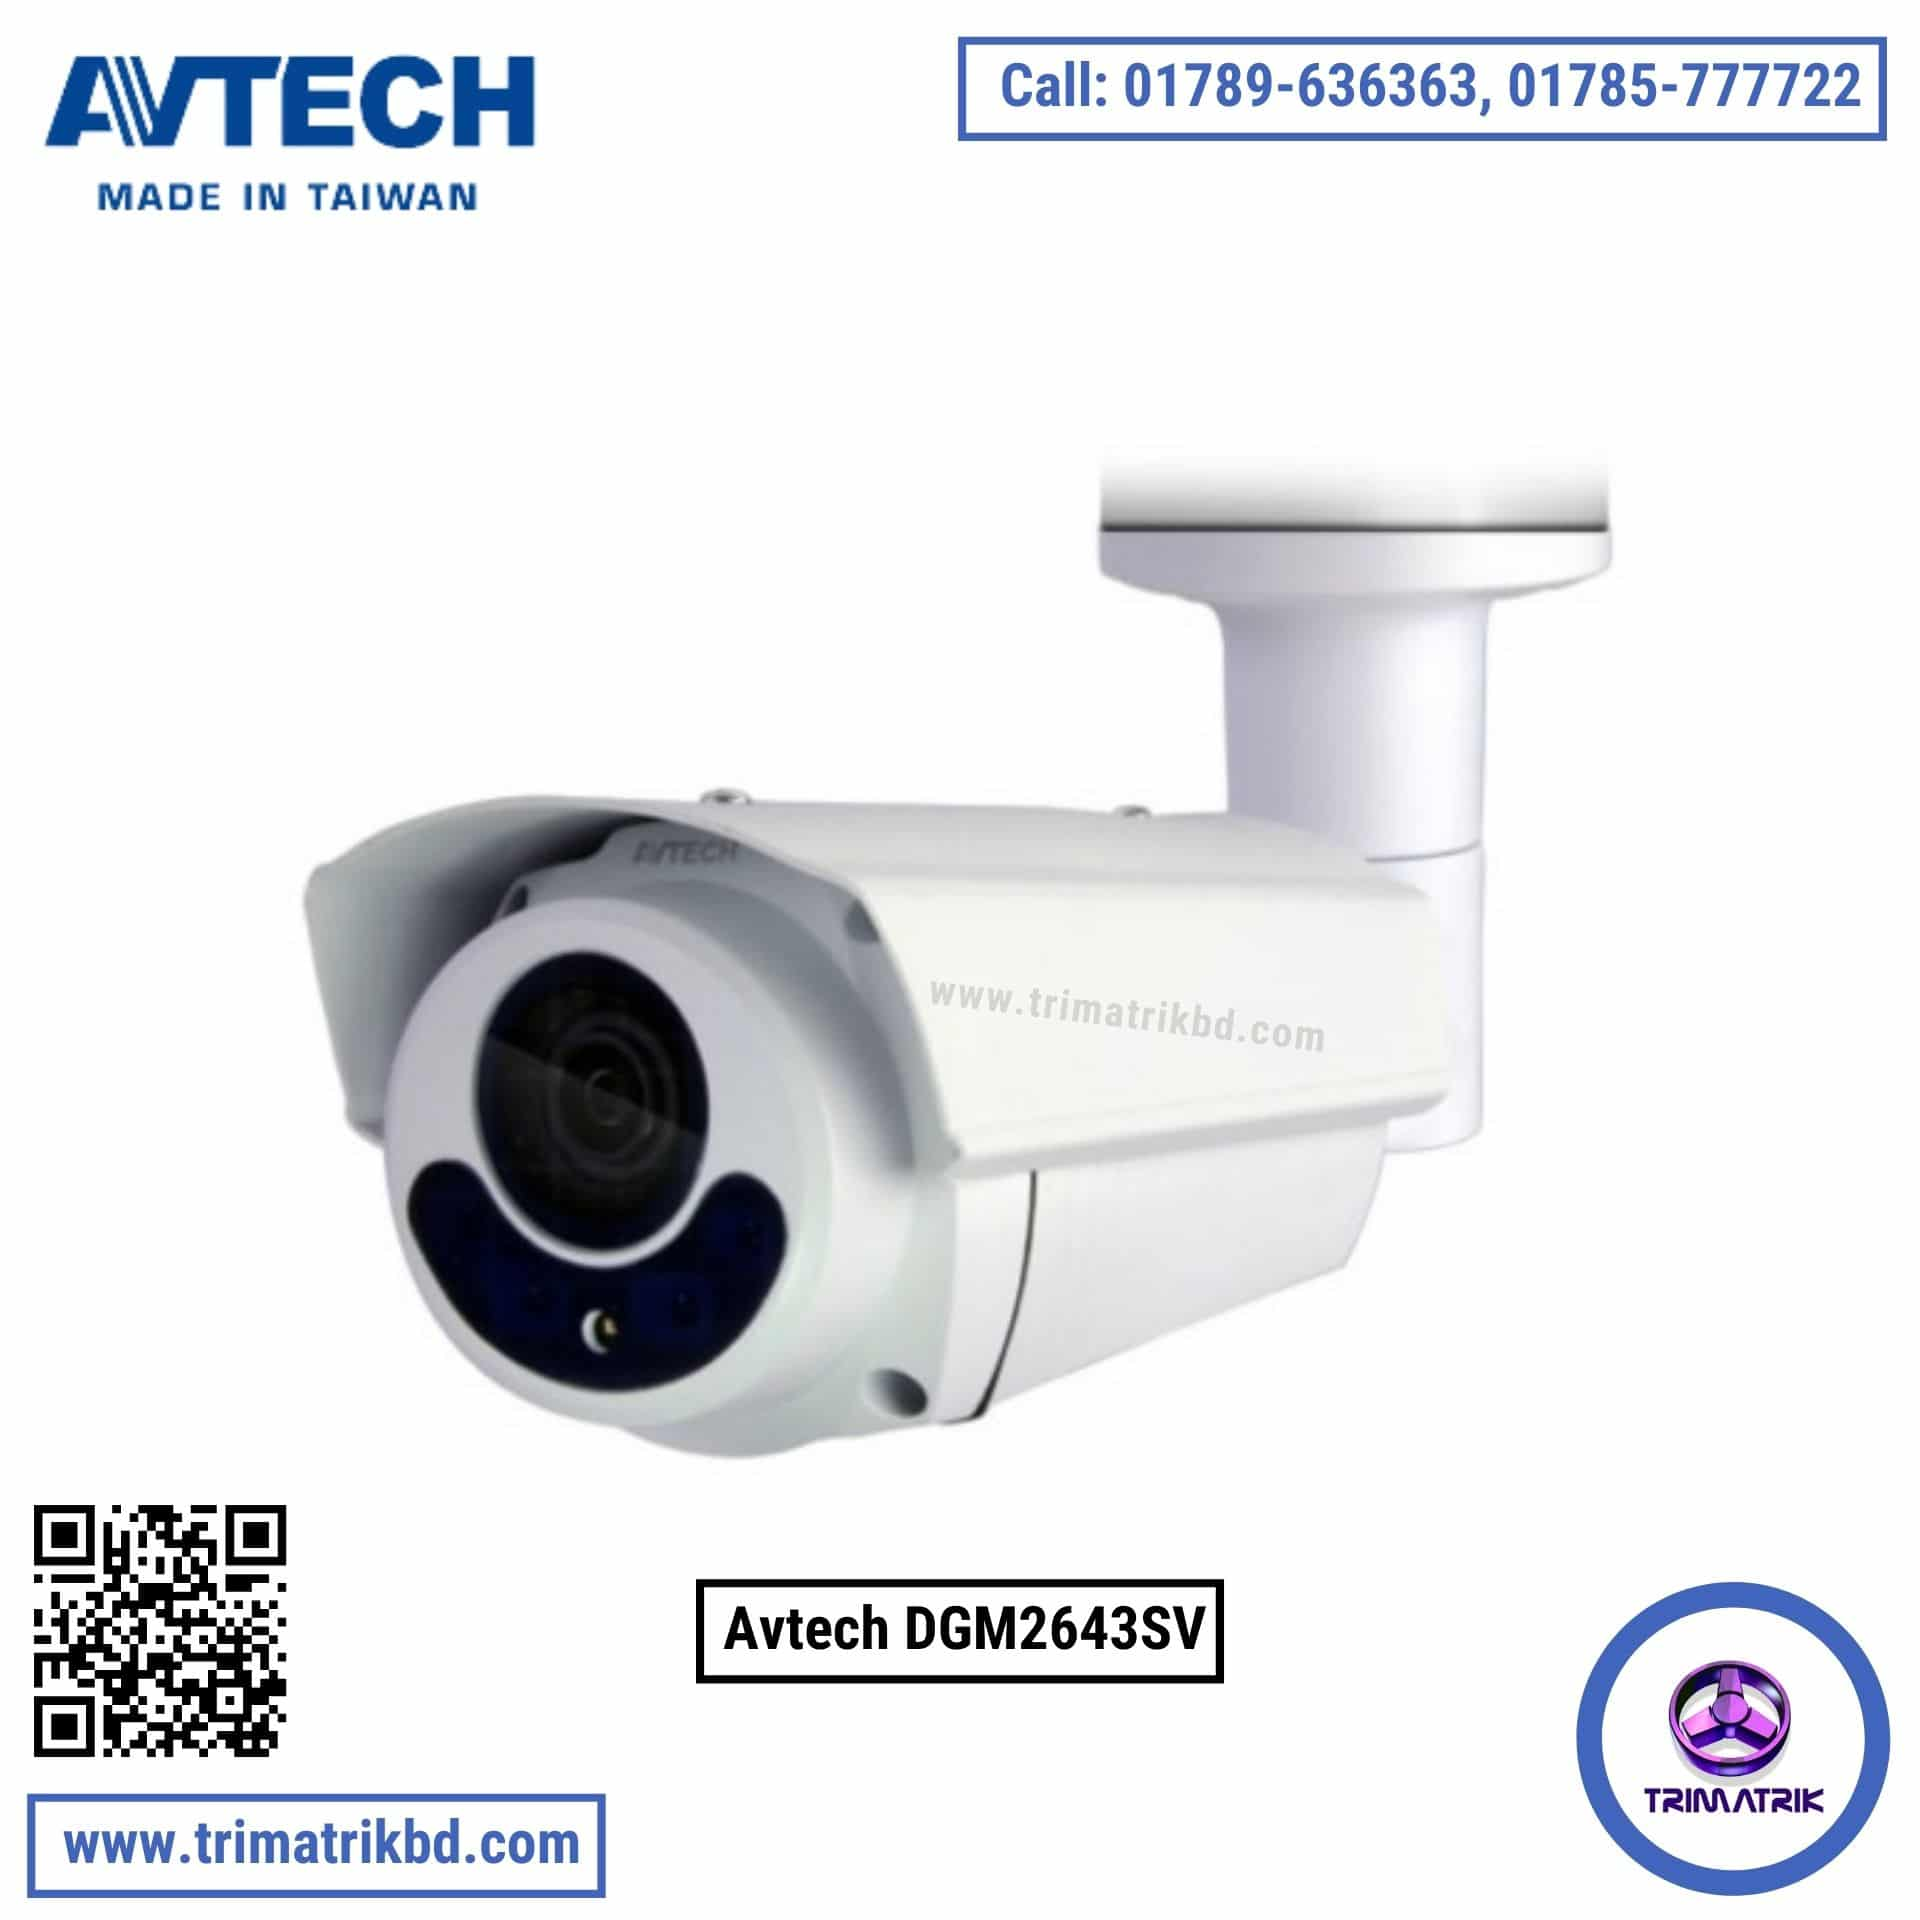 Avtech DGM2643SV Bangladesh, TRIMATRIK